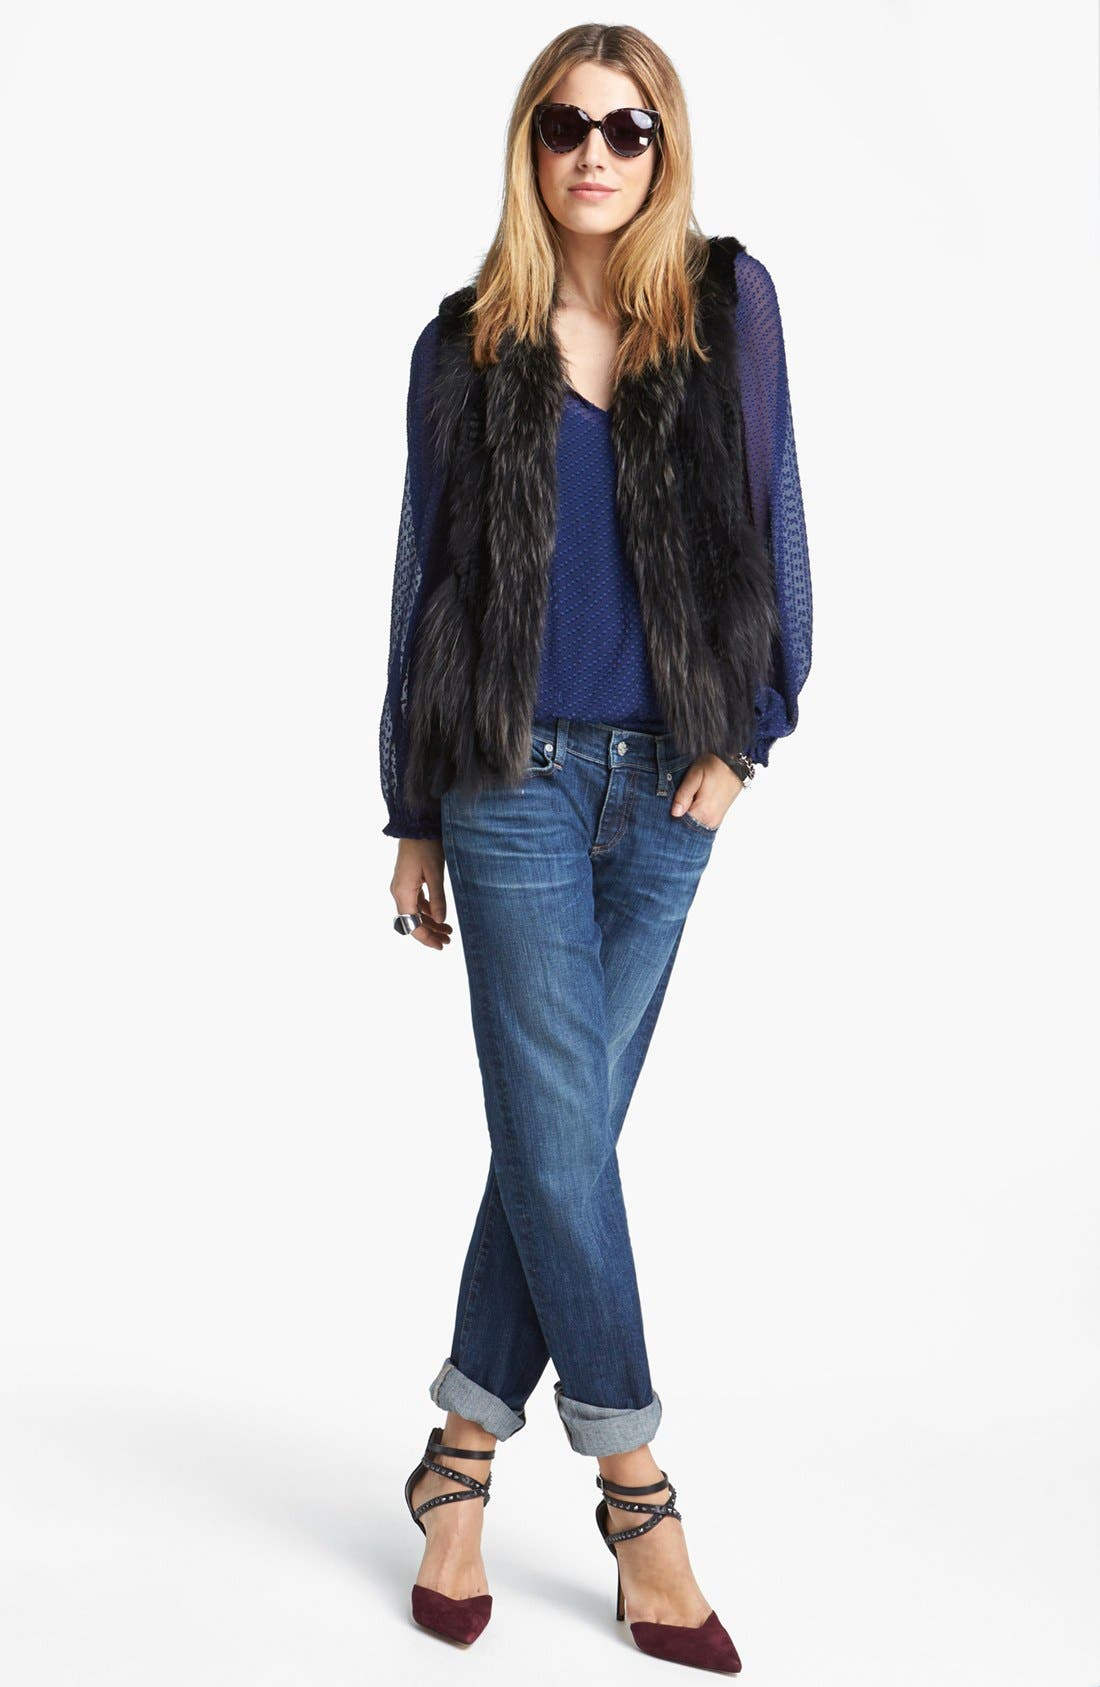 Alternate Image 1 Selected - AG Jeans Relaxed Jeans, Ella Moss Top & Linda Richards Vest